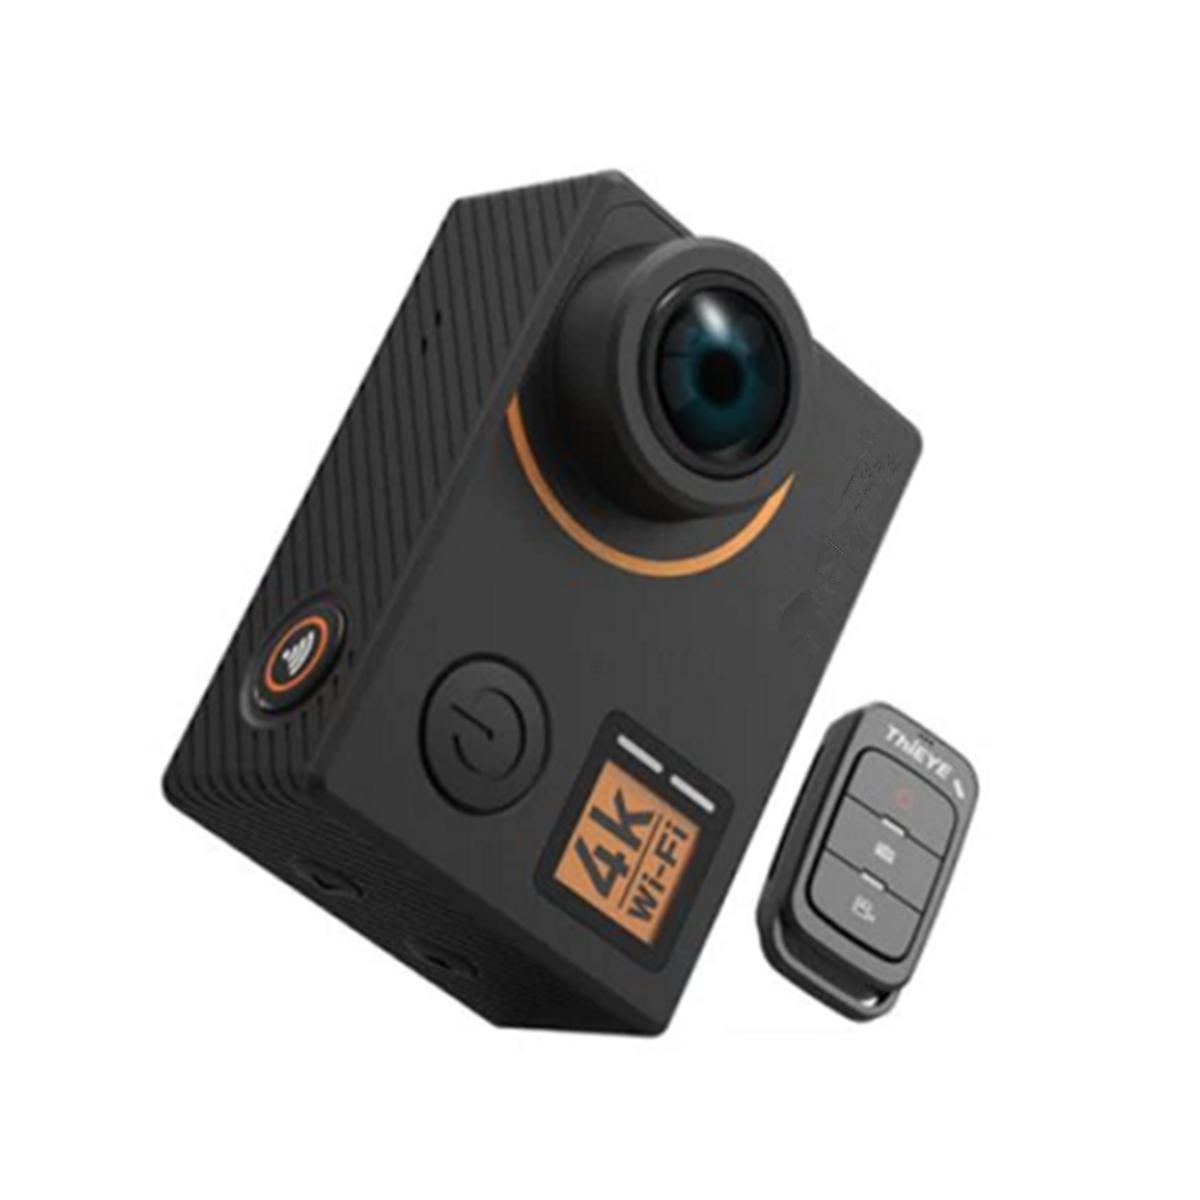 2 ЖК-дисплей Широкий формат Водонепроницаемый T5 Wi-Fi Камера фото Камера 16mp 1080 P Full HD 4x зум Дистанционное управление потребителей Камера